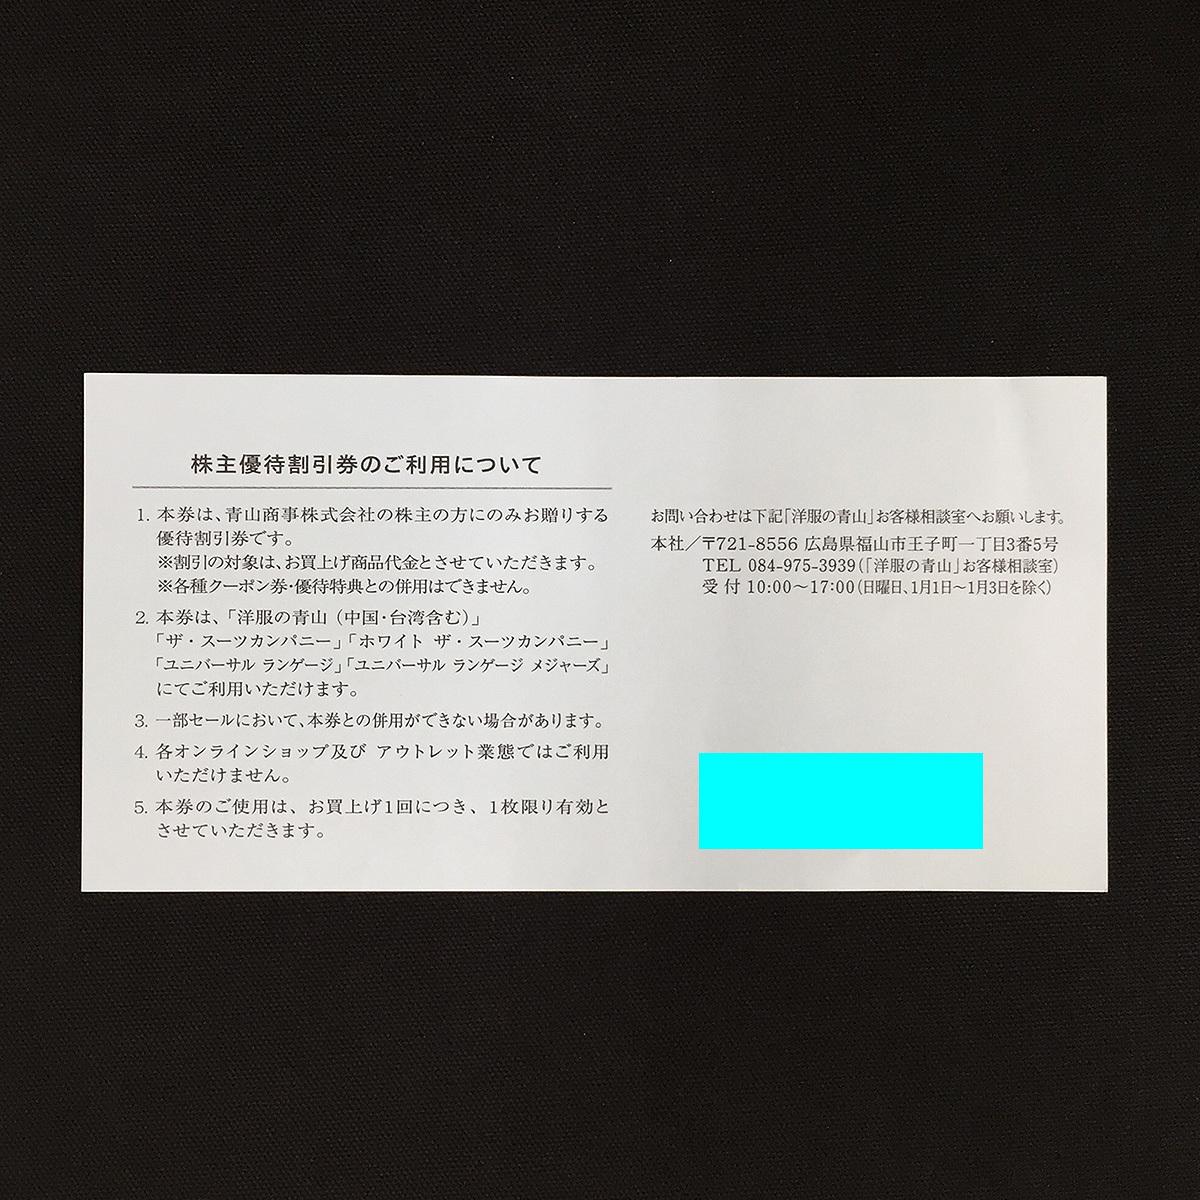 SA90 [送料無料] 青山商事株式会社 洋服の青山 株主優待割引券 20%OFF×3枚 2022年6月30日まで_画像2